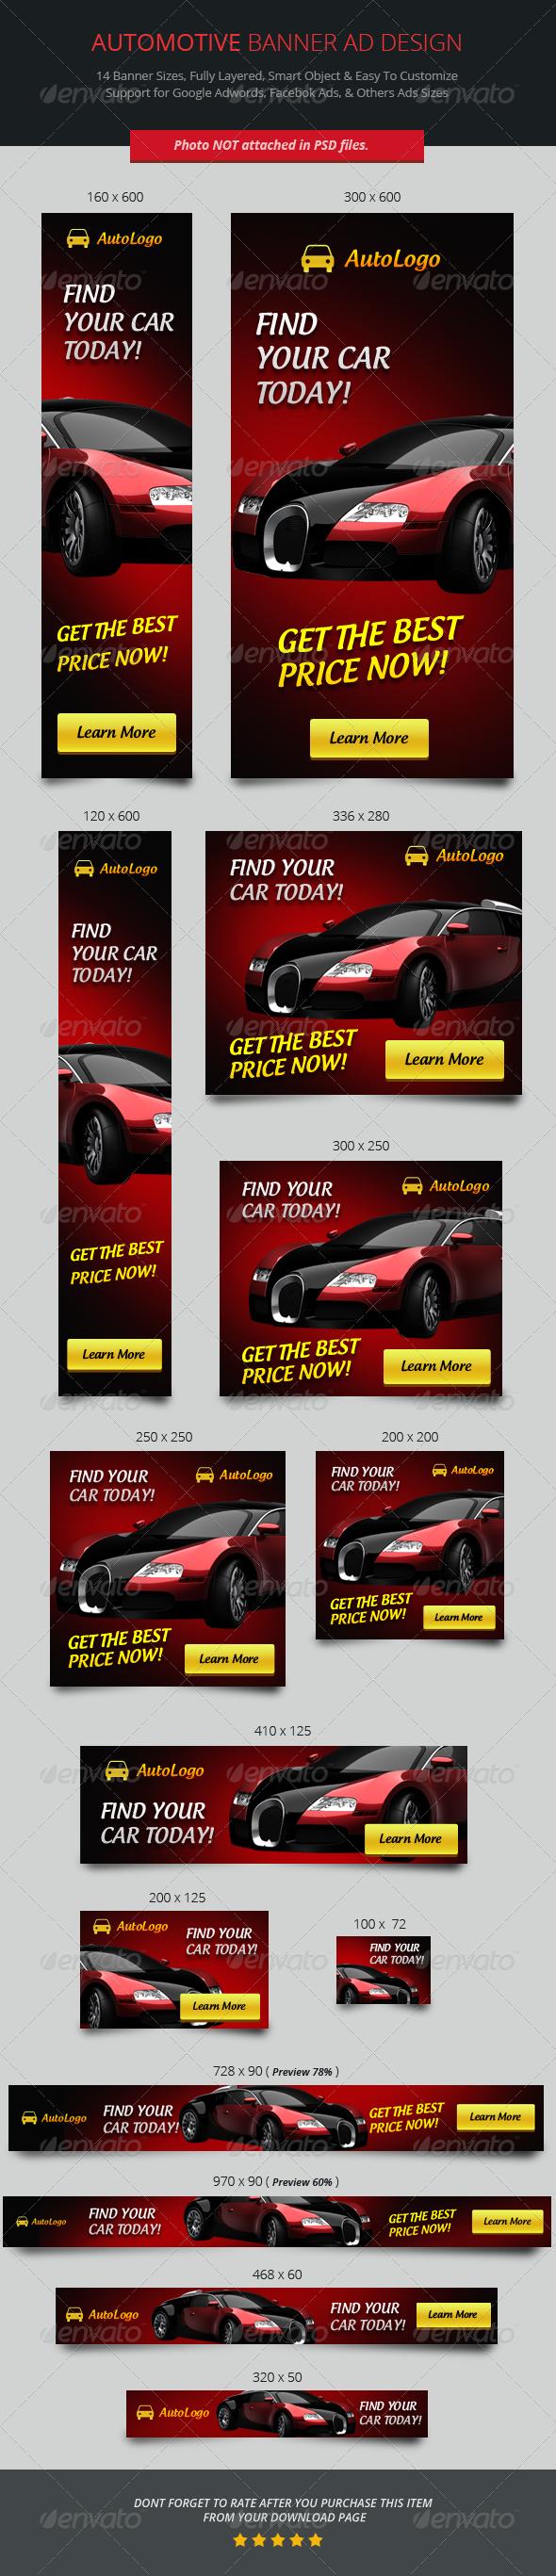 Automotive Banner ad Design - Banners & Ads Web Elements